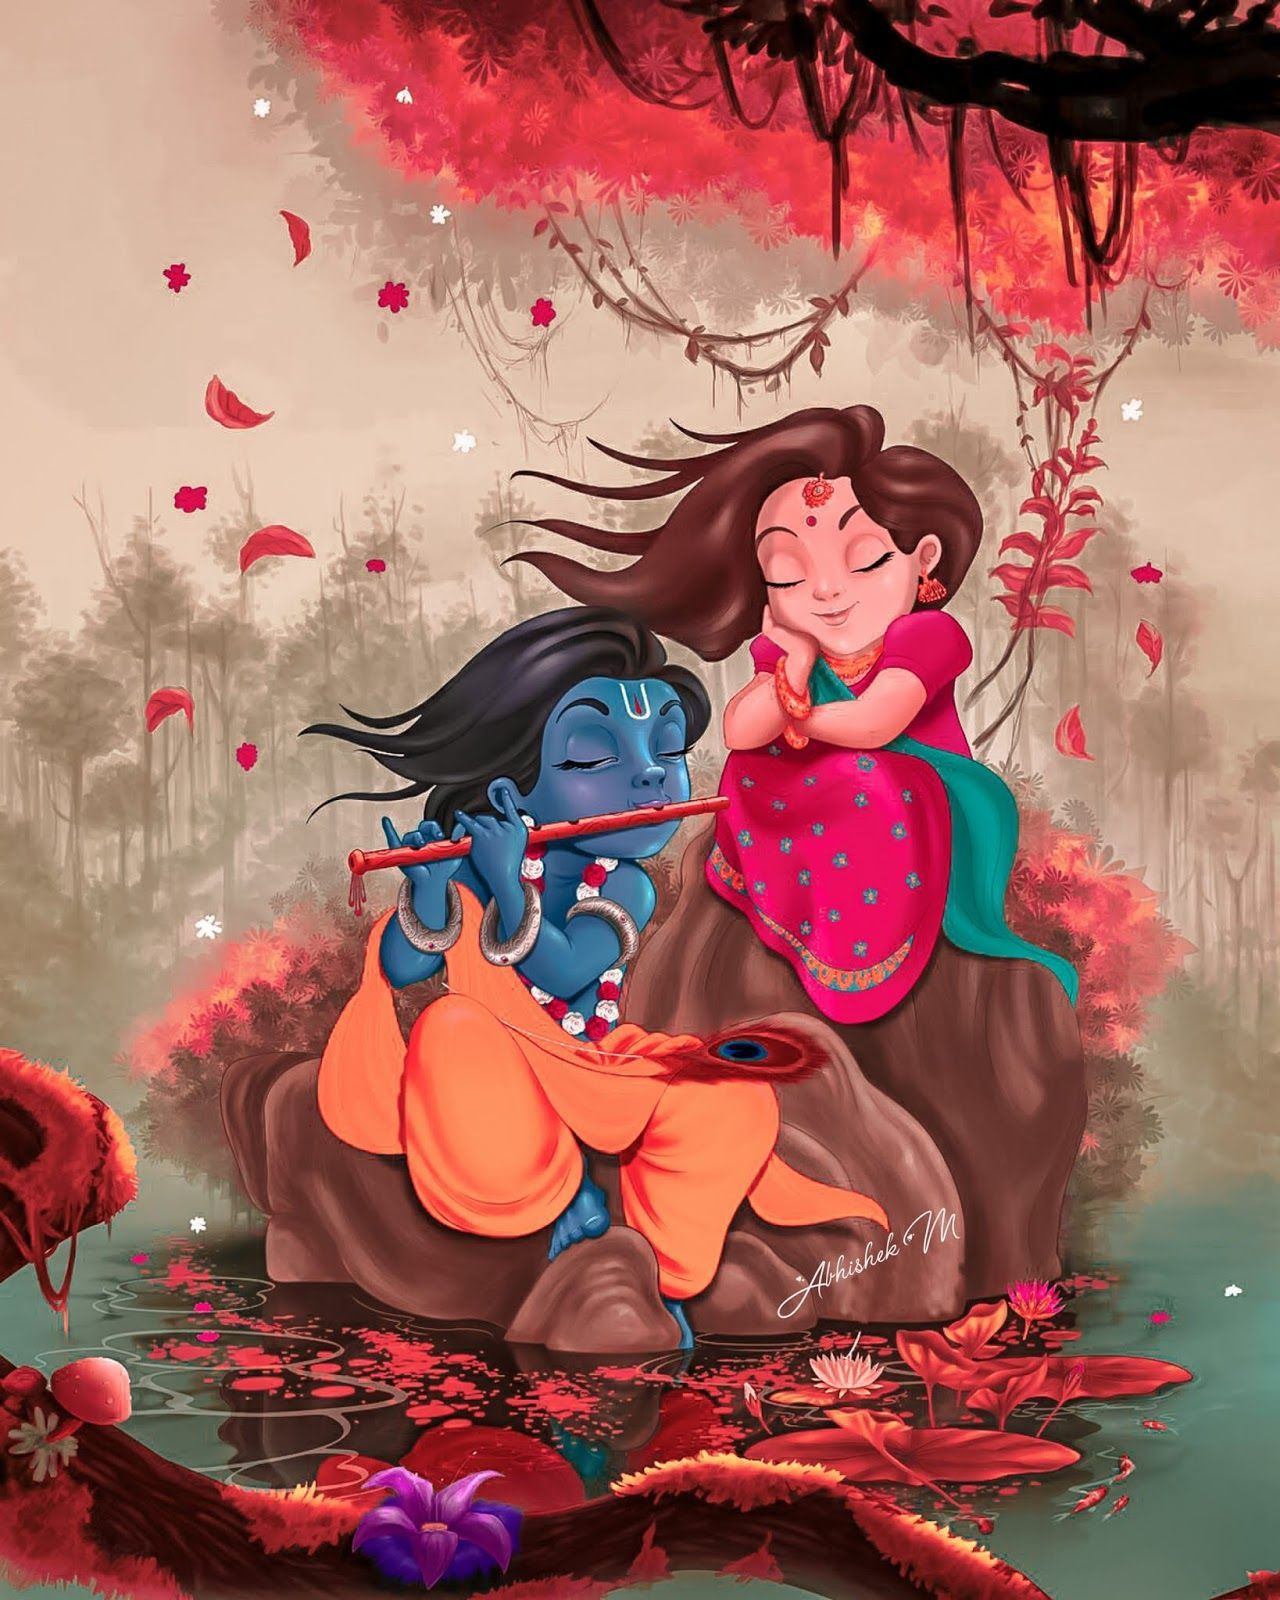 Krishna Images In 2020 Radha Krishna Art Krishna Wallpaper Radha Krishna Wallpaper